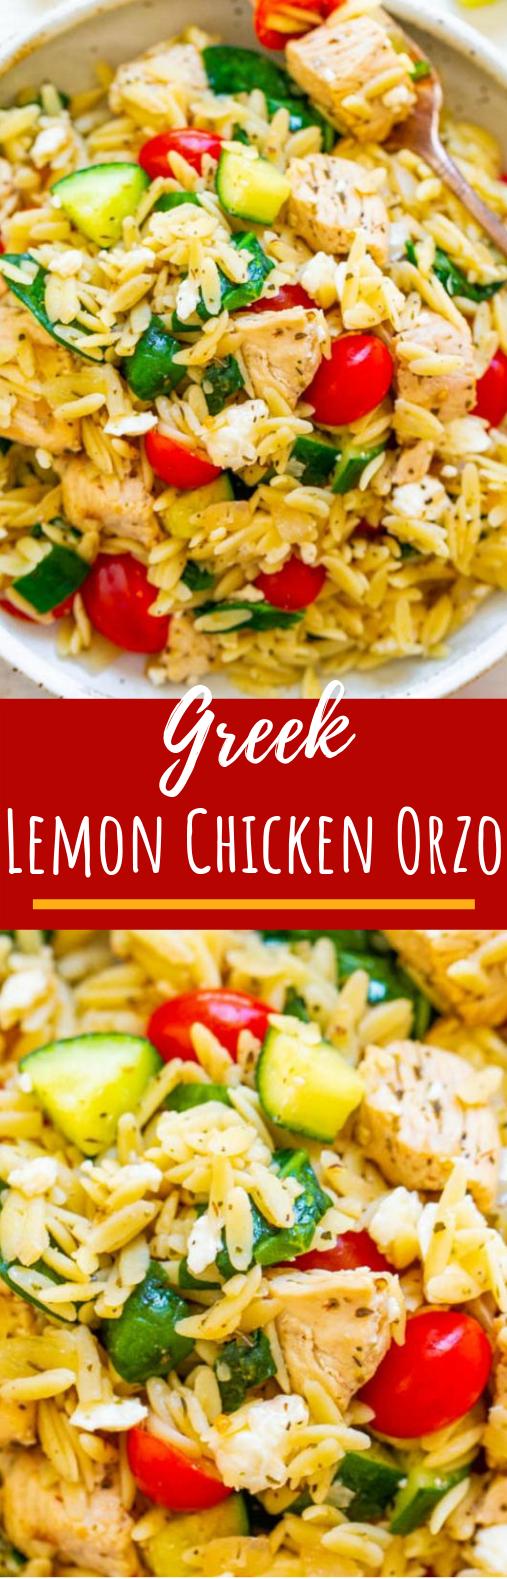 Greek Lemon Chicken and Orzo #dinner #healthy